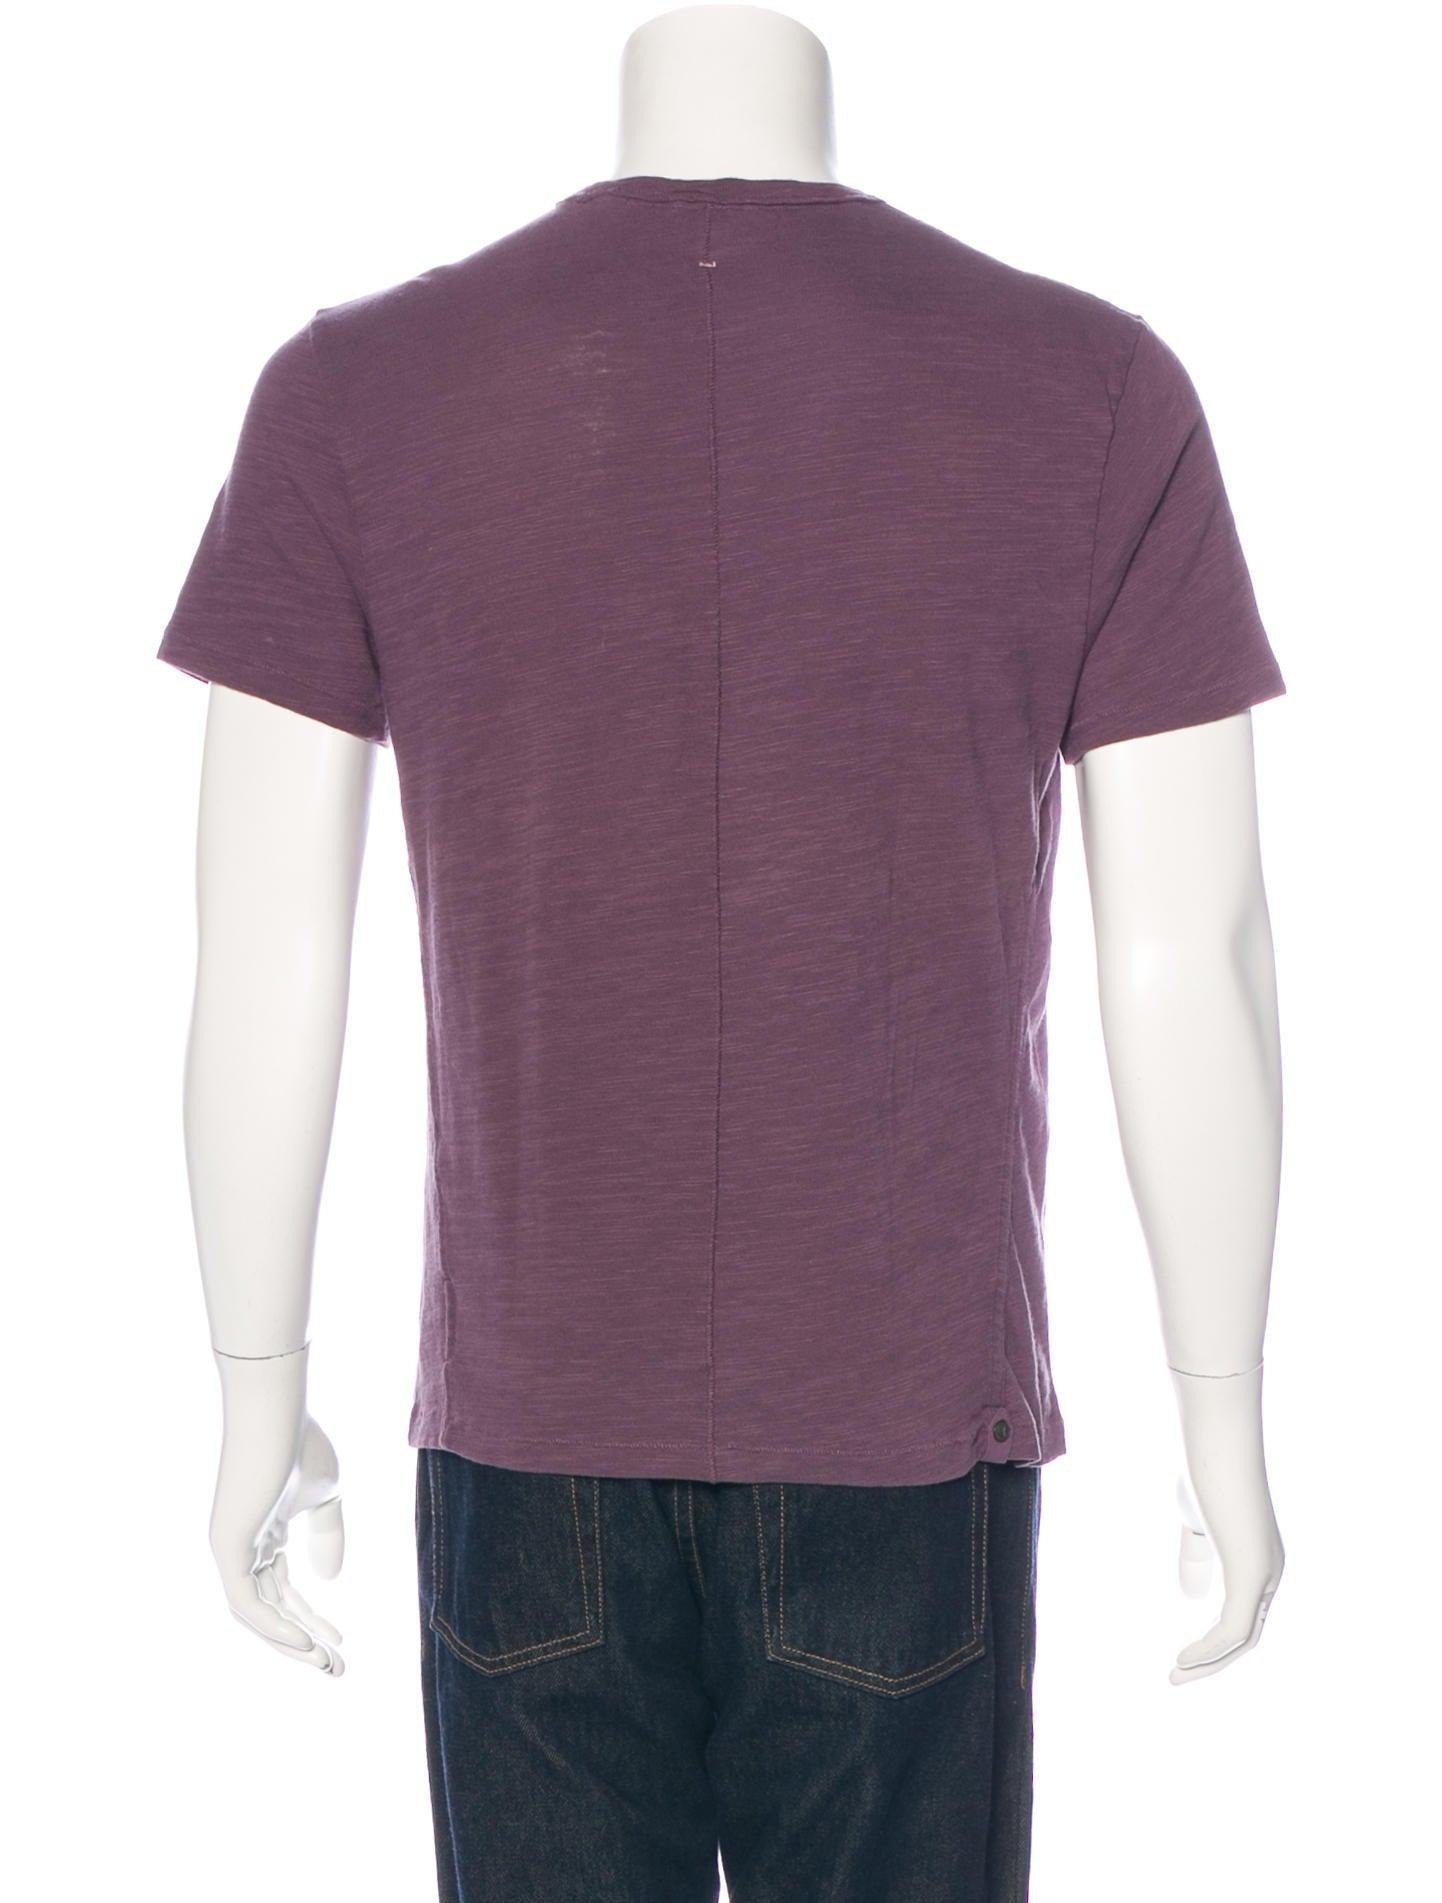 Rag bone crew neck t shirt clothing wragb67119 the for Rag and bone t shirts